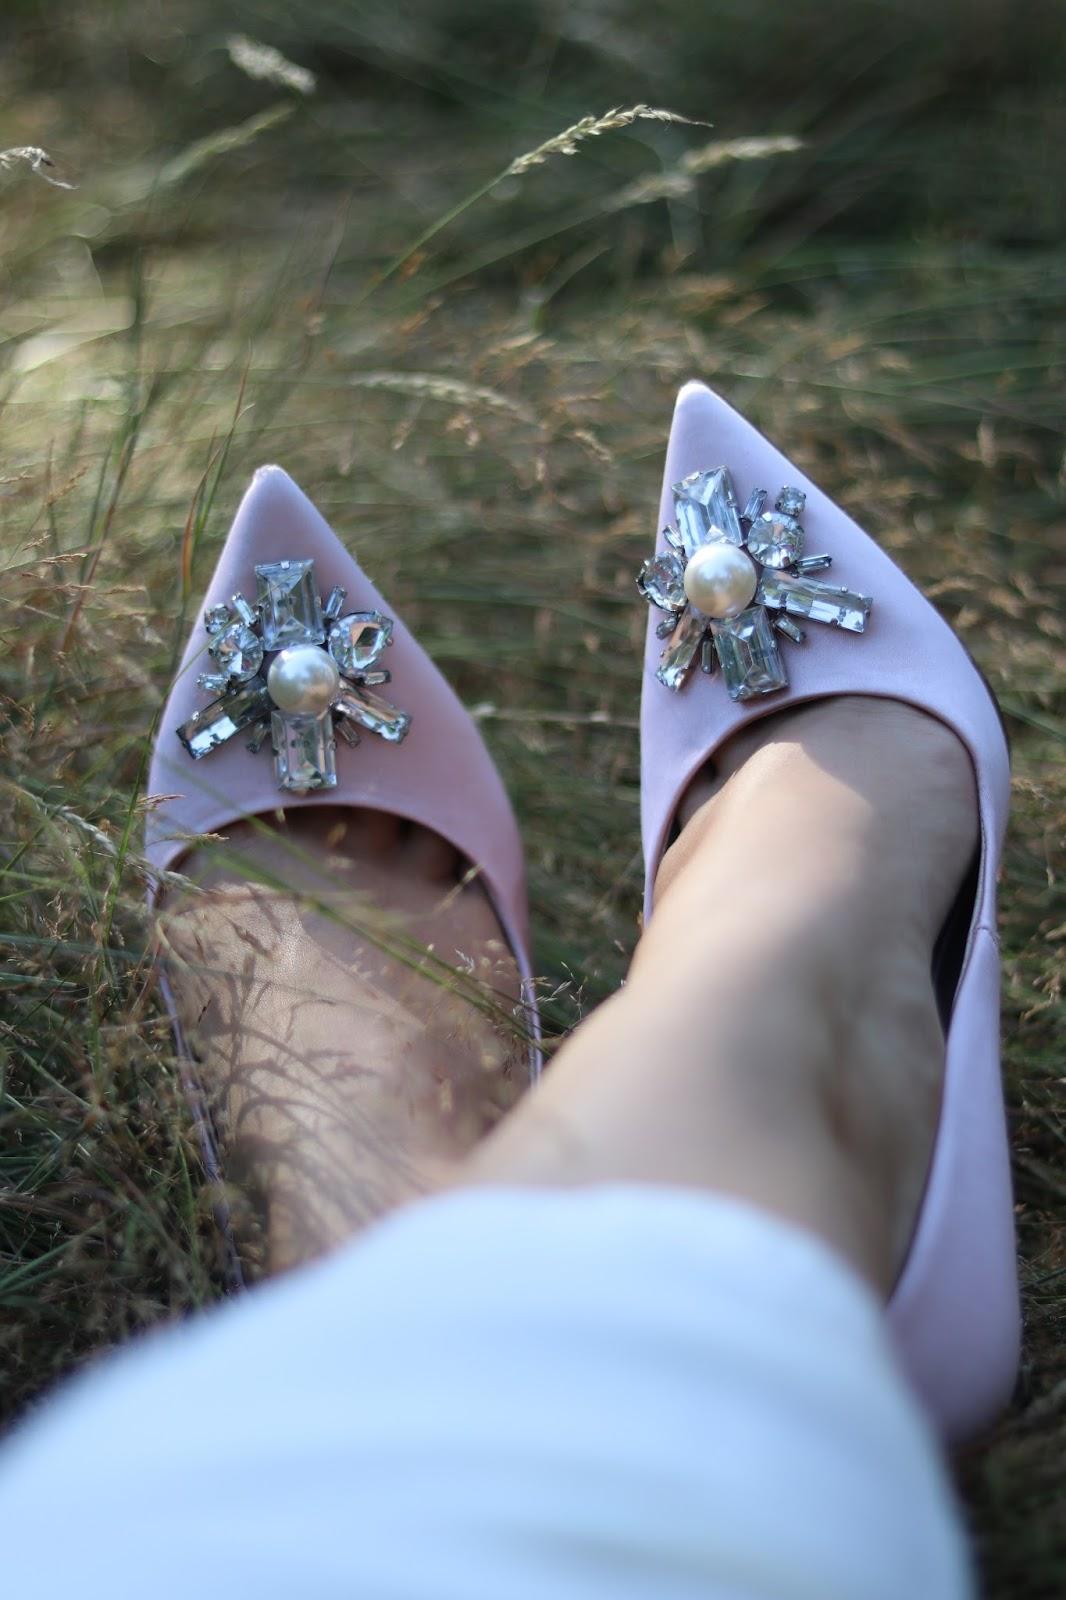 Katie Heath wearing ASOS Wedding Dress and satin pink bejewelled heels in Richmond Park, London